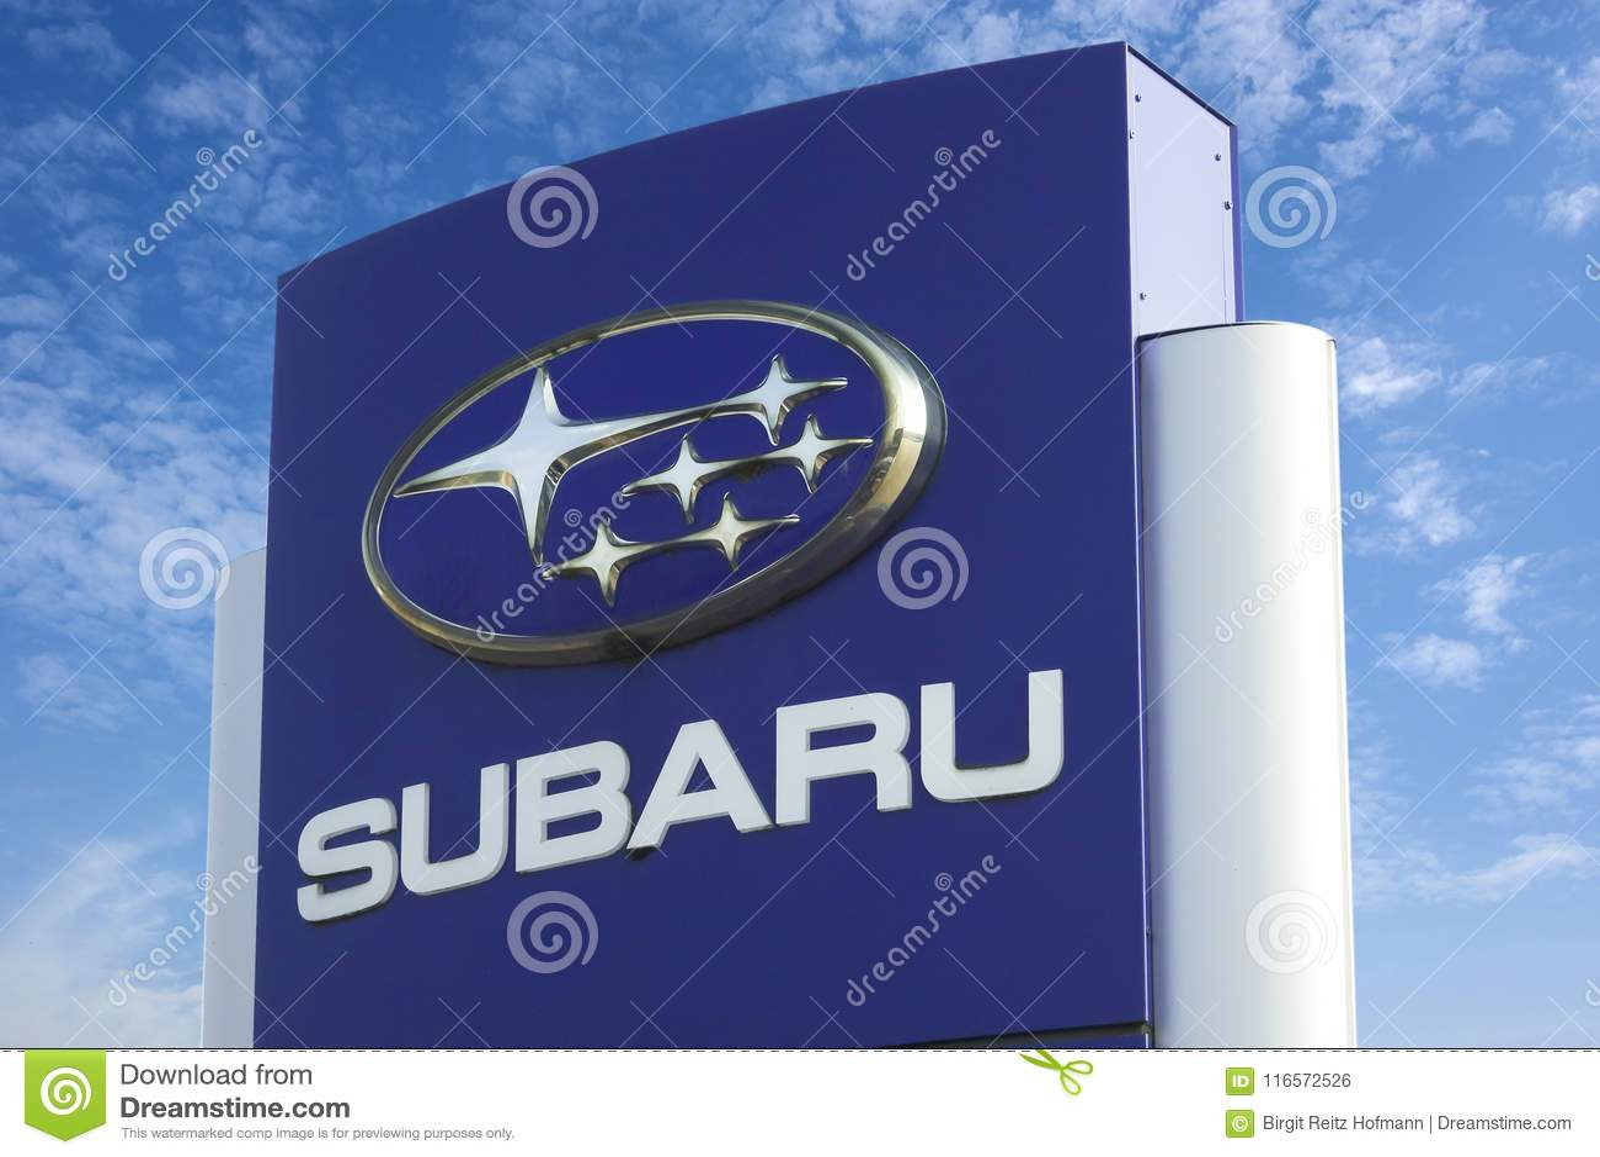 Subaru Logo Editorial Photo Image Of Brand Transportation 116572526